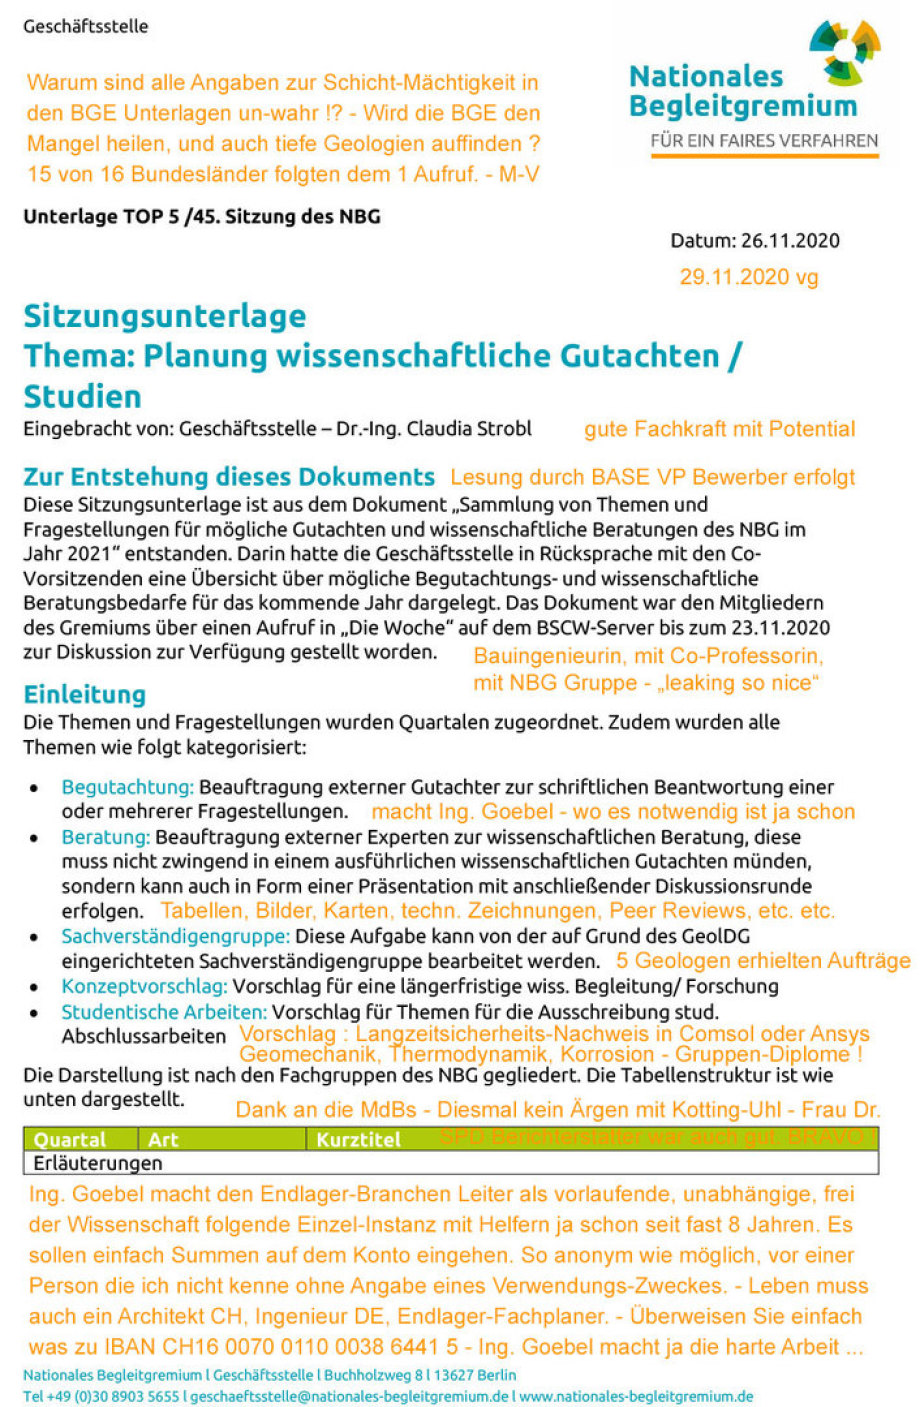 NBG Endlager Themen-Planung 2021 - Kommentar Ing. Goebel 3